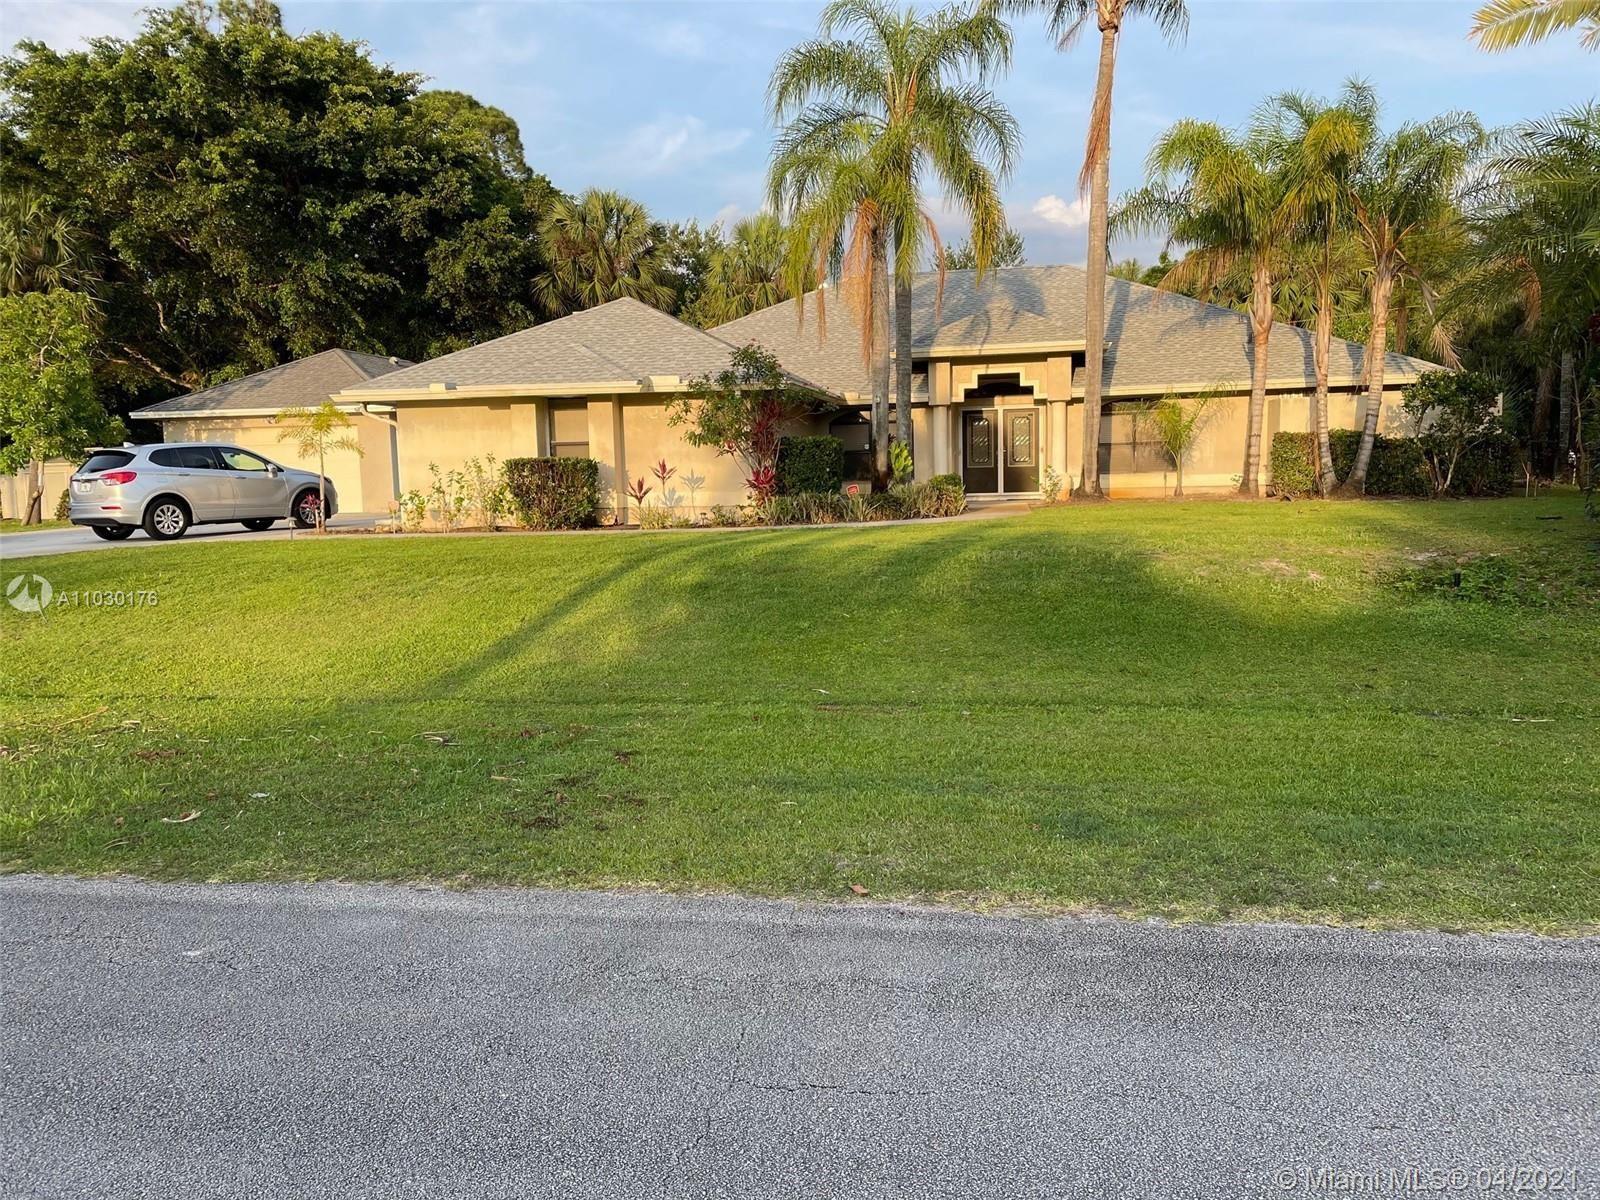 2057 SW Driftwood St, Port Saint Lucie, FL 34953 - #: A11030176